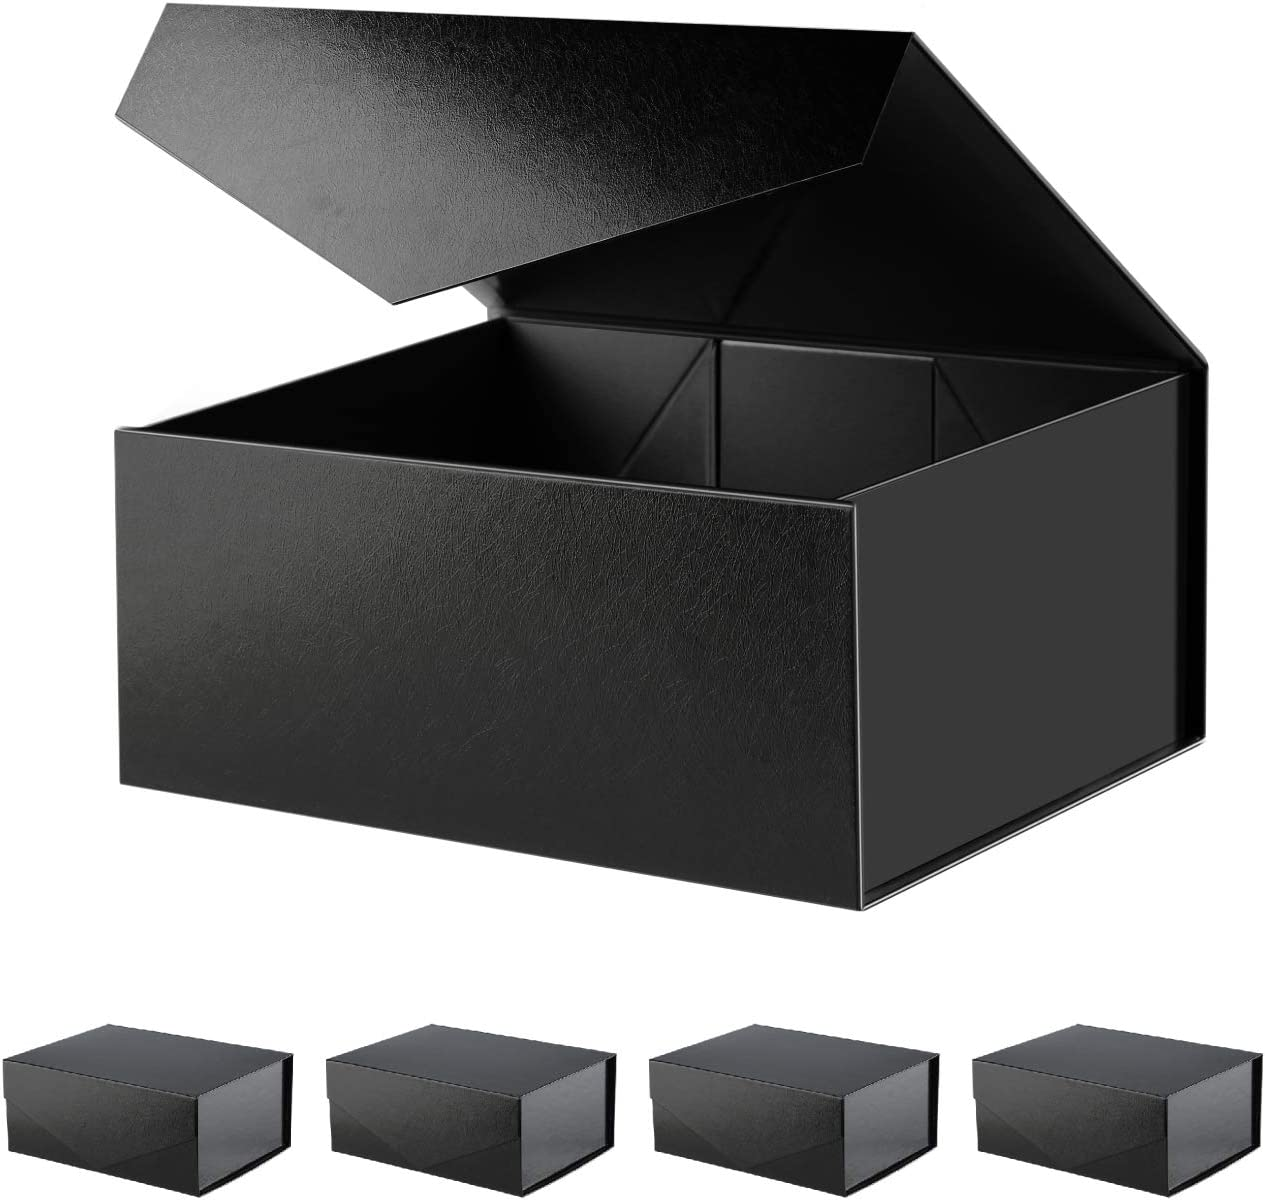 Black Gift Box Add-On